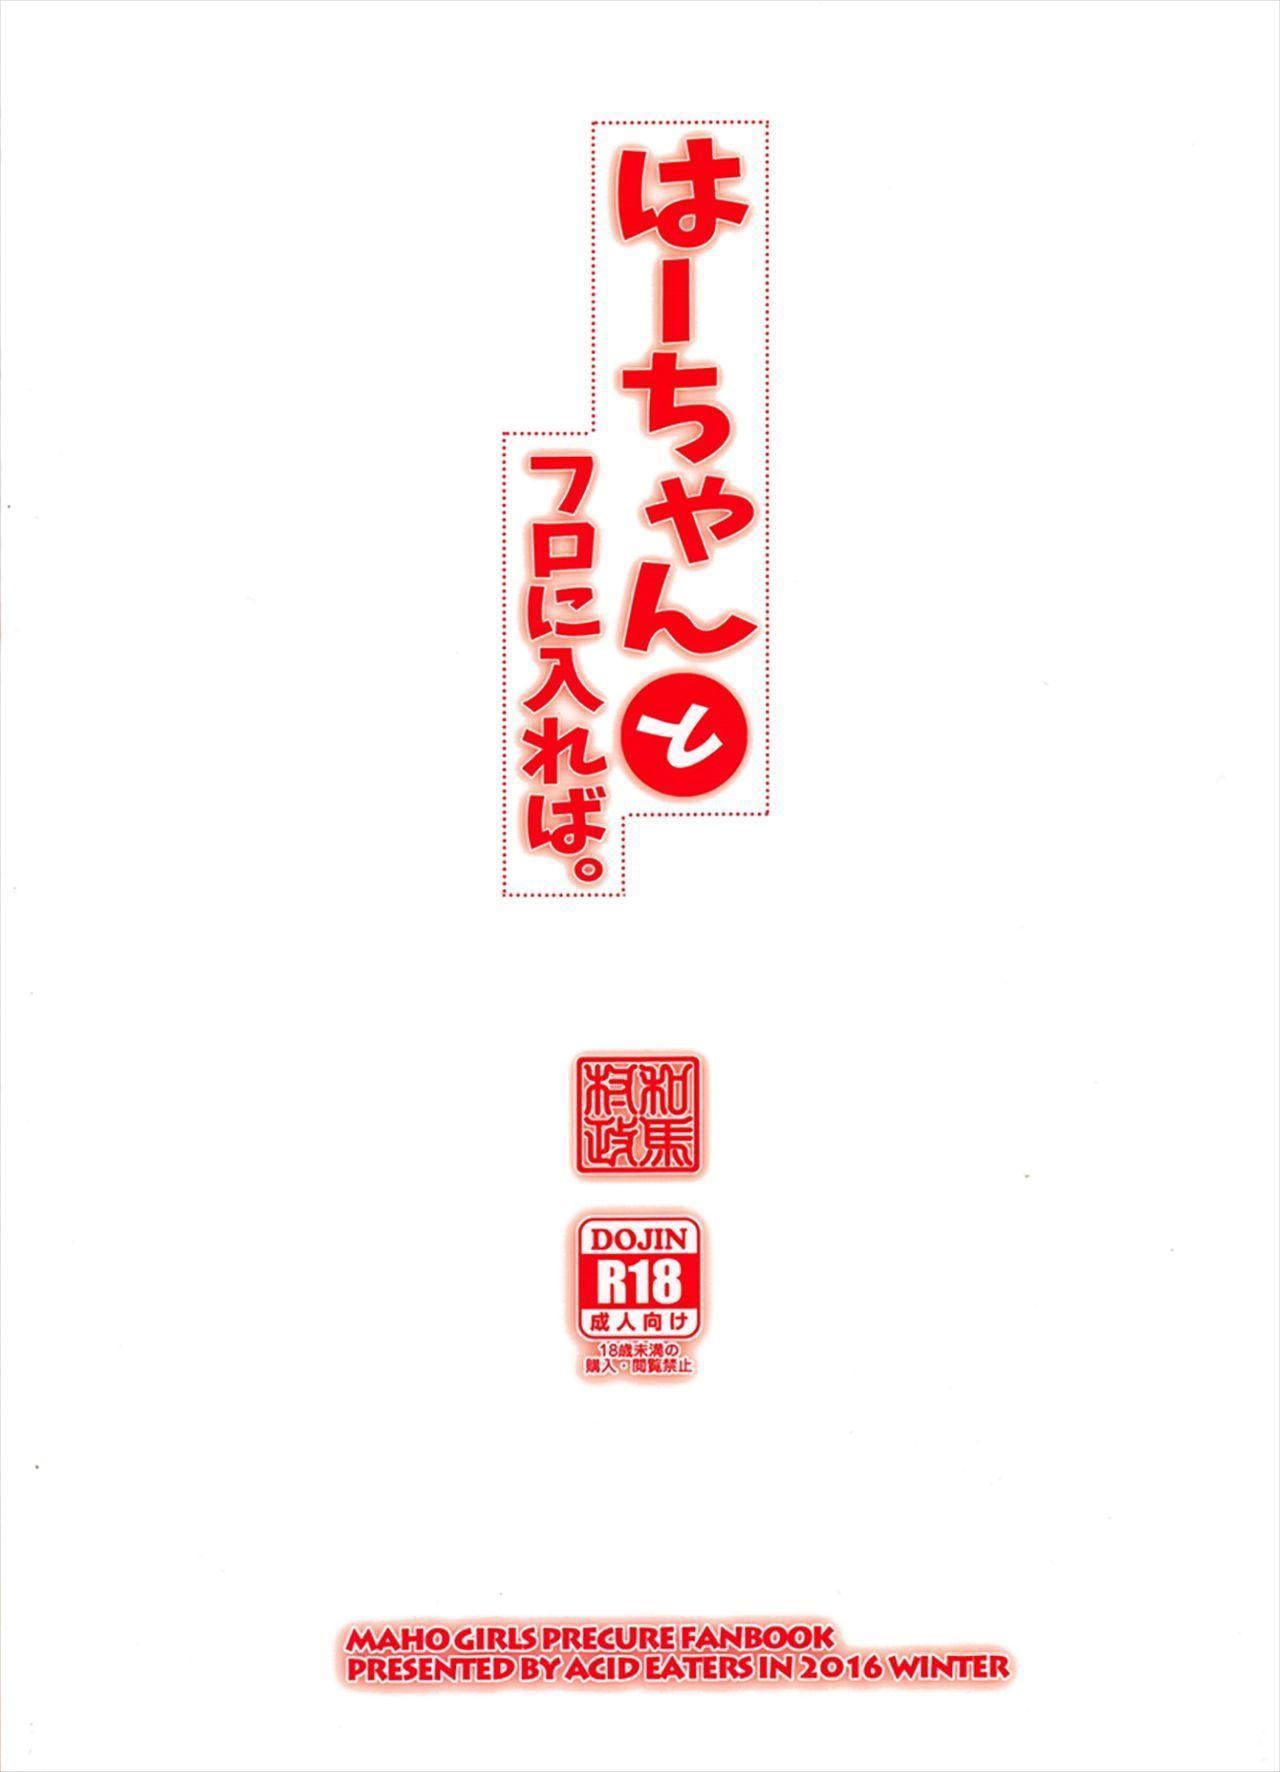 (C91) [ACID EATERS (Kazuma Muramasa)] Haa-chan to Furo ni Haireba.   Taking a Bath With Ha-chan. (Mahou Tsukai Precure!) [English] [nisashi13 + MaxChronos] 25